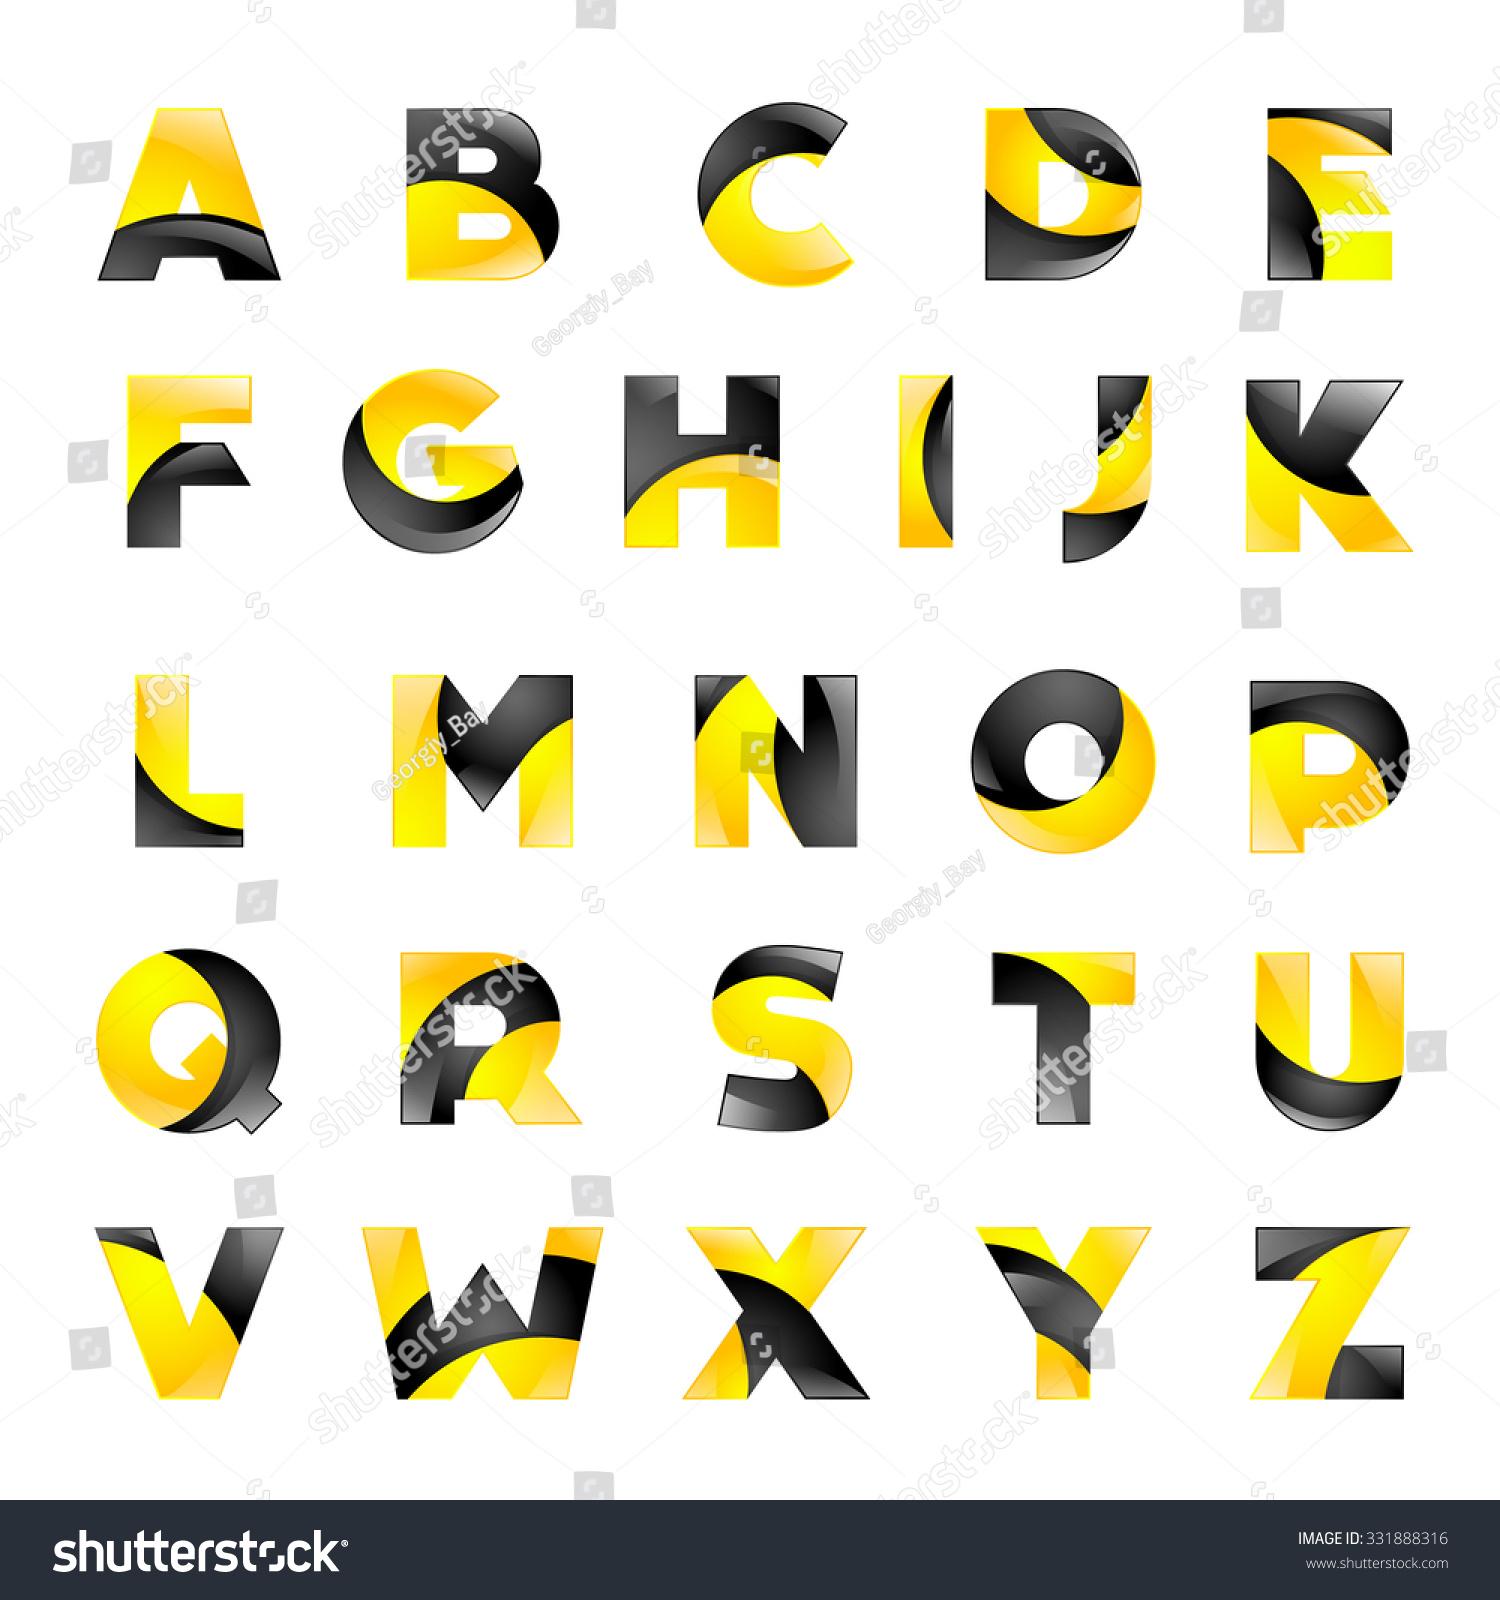 Creative Alphabet Letter Designs Beautiful Alphabet Letter Designs